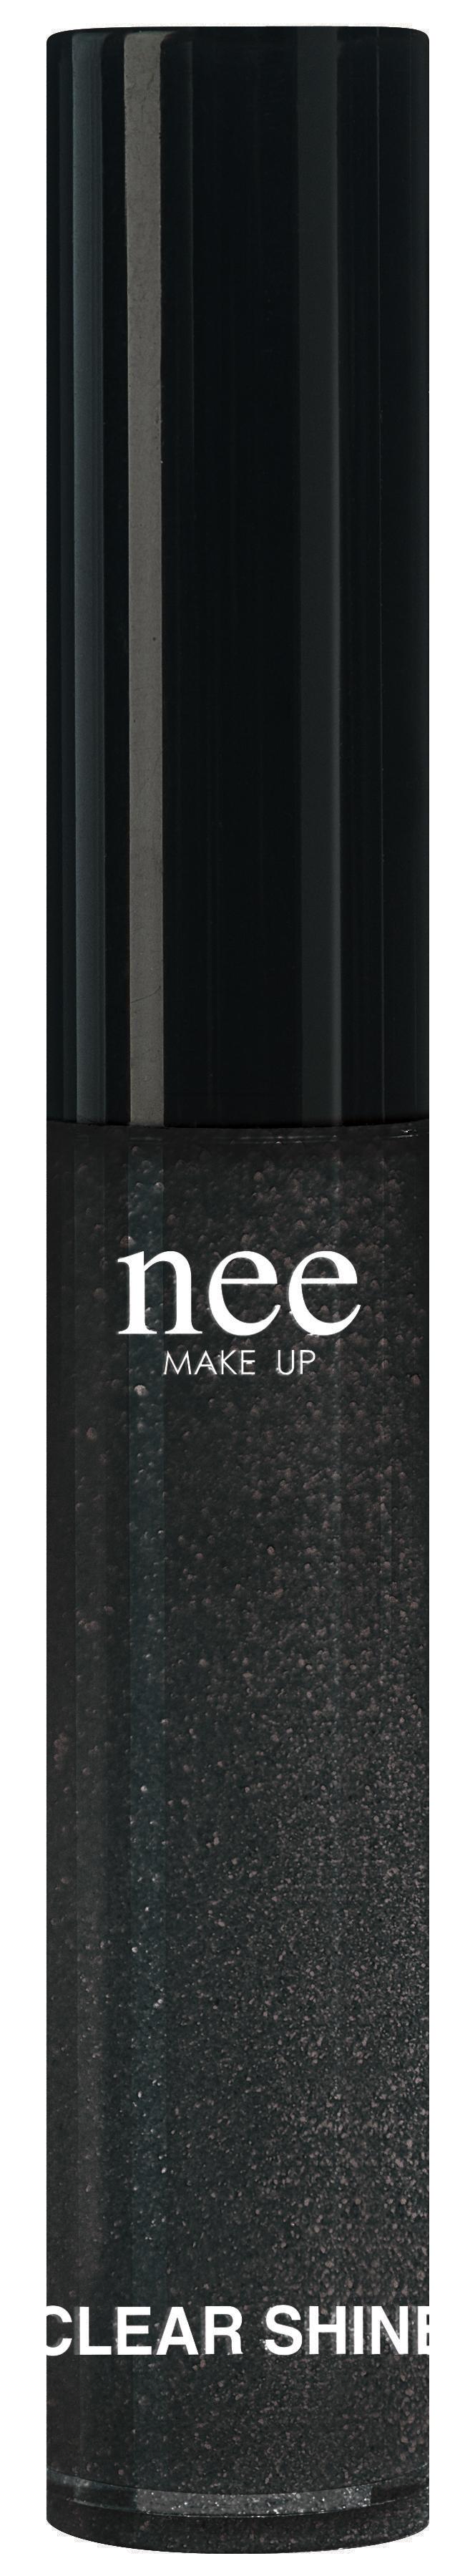 Nee Make-Up Clear Shine Gloss